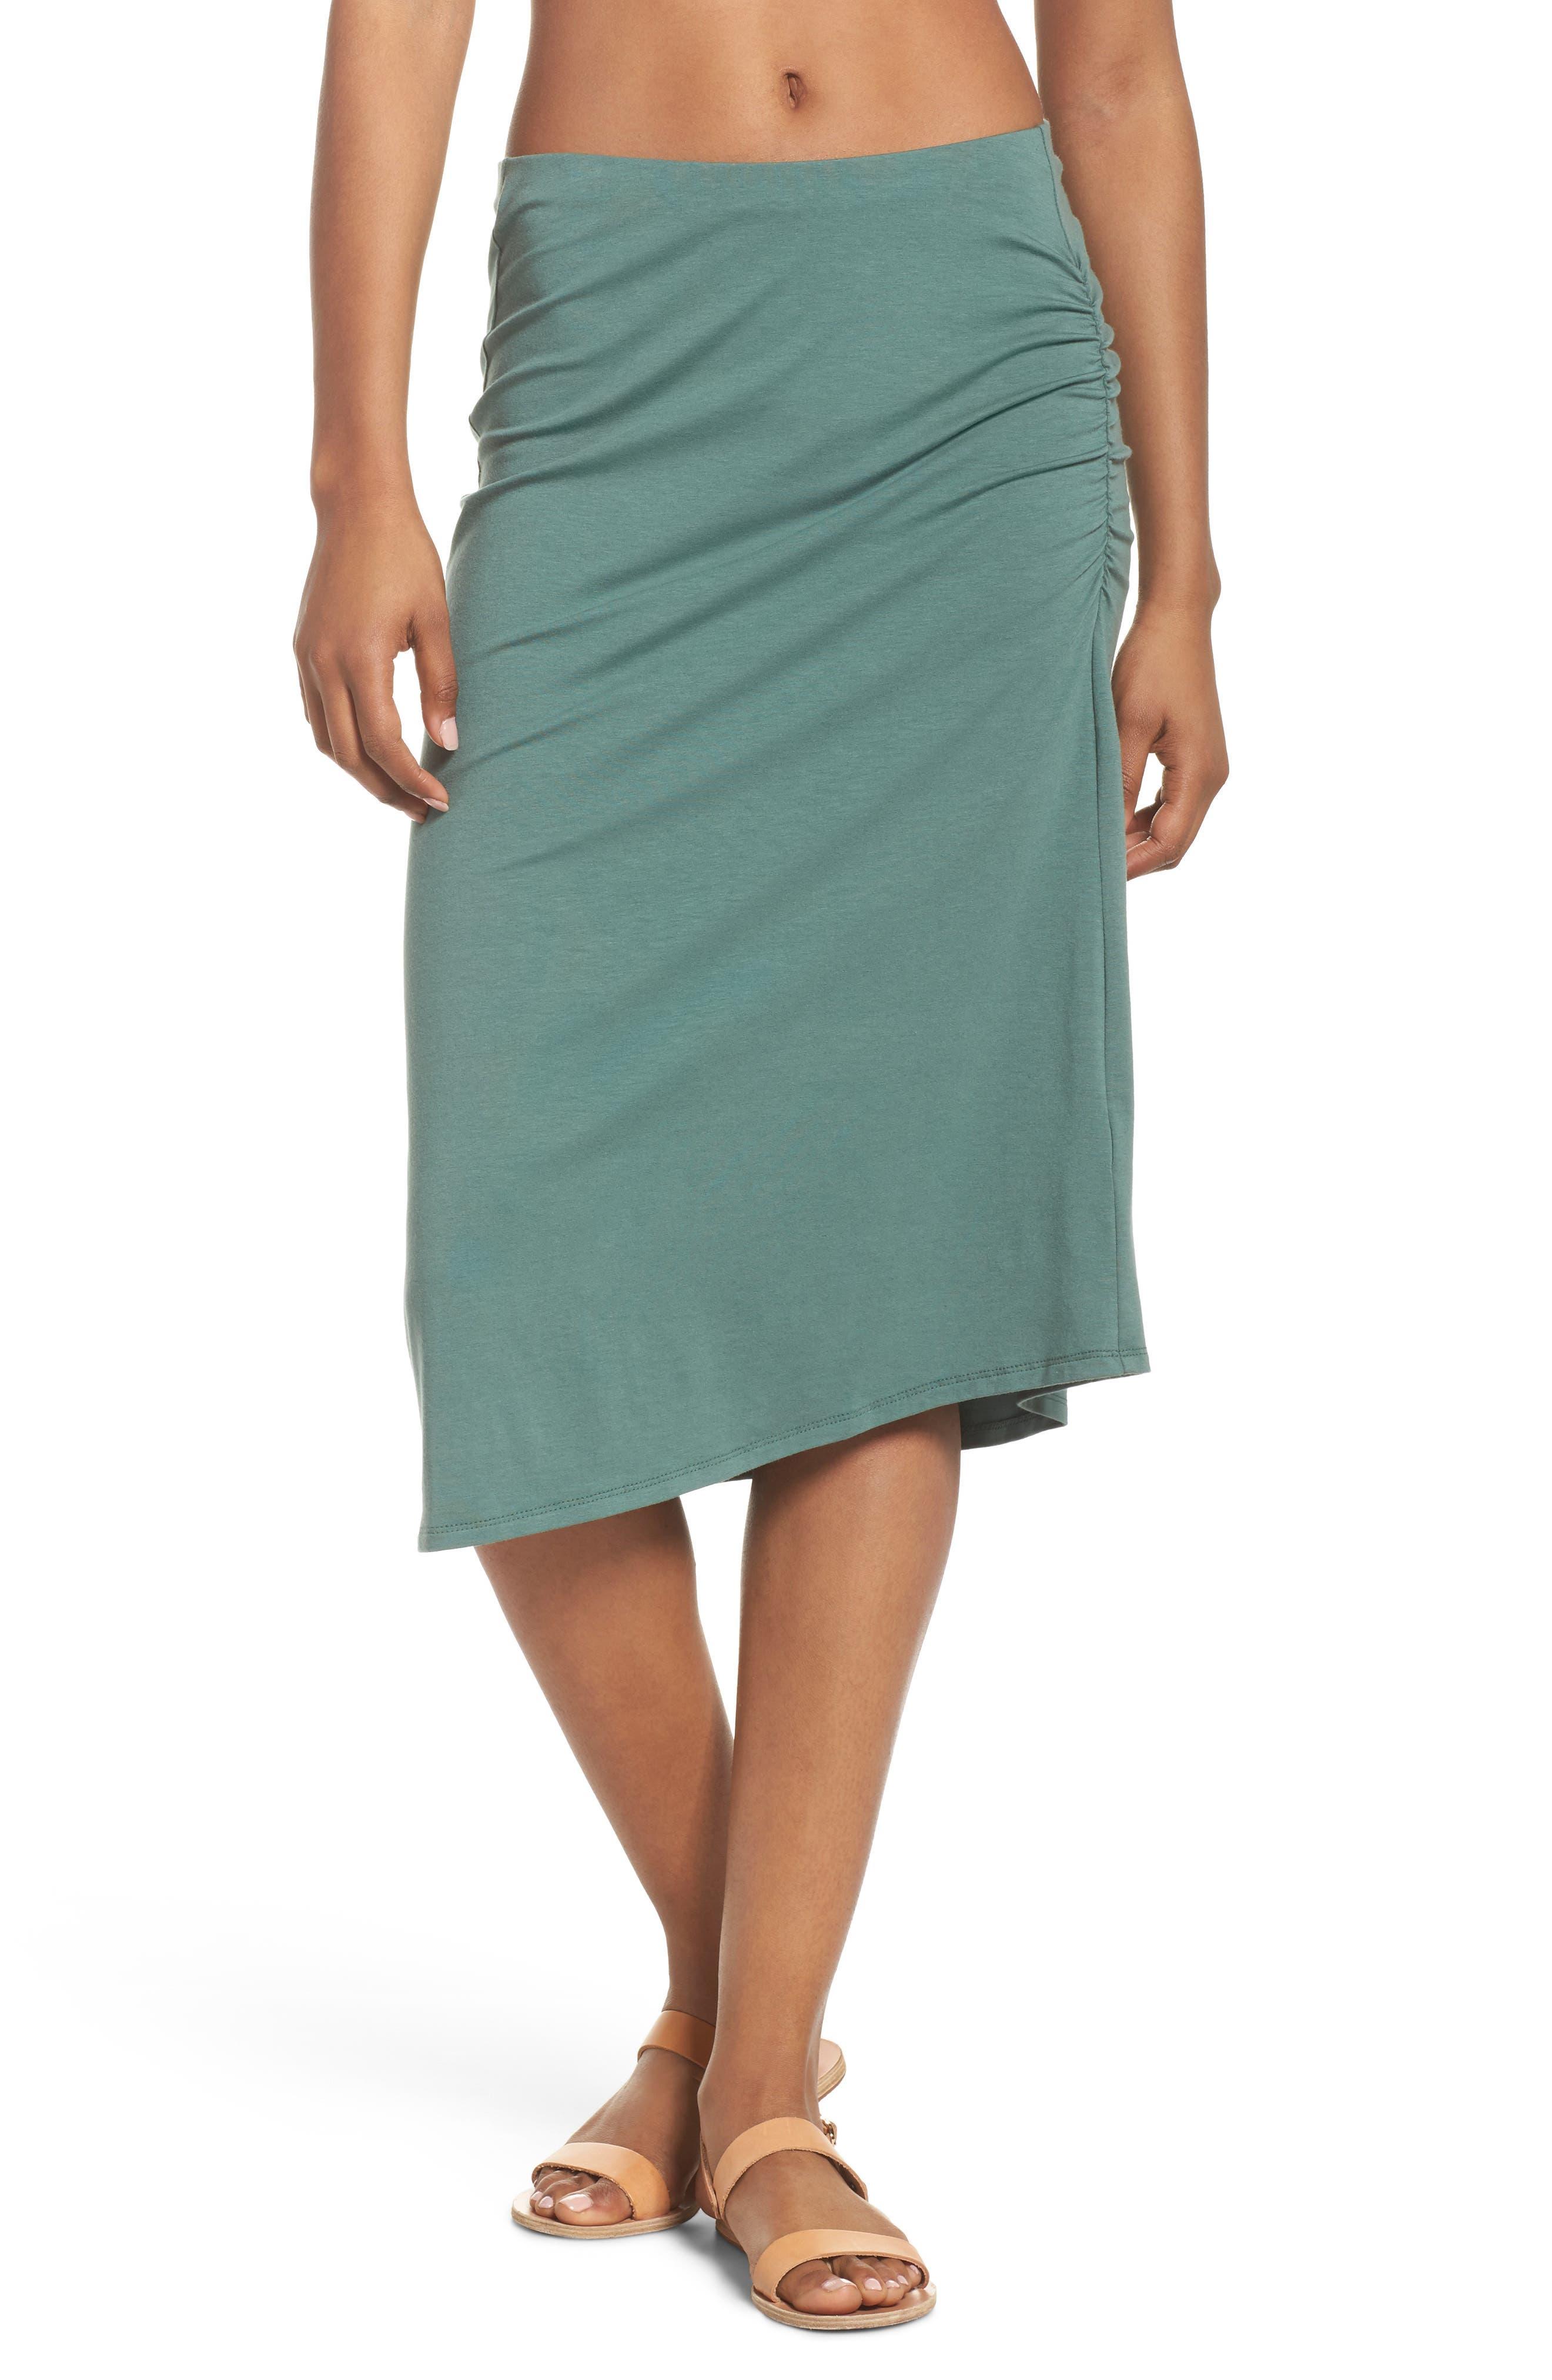 Dream Song Skirt,                         Main,                         color, 300